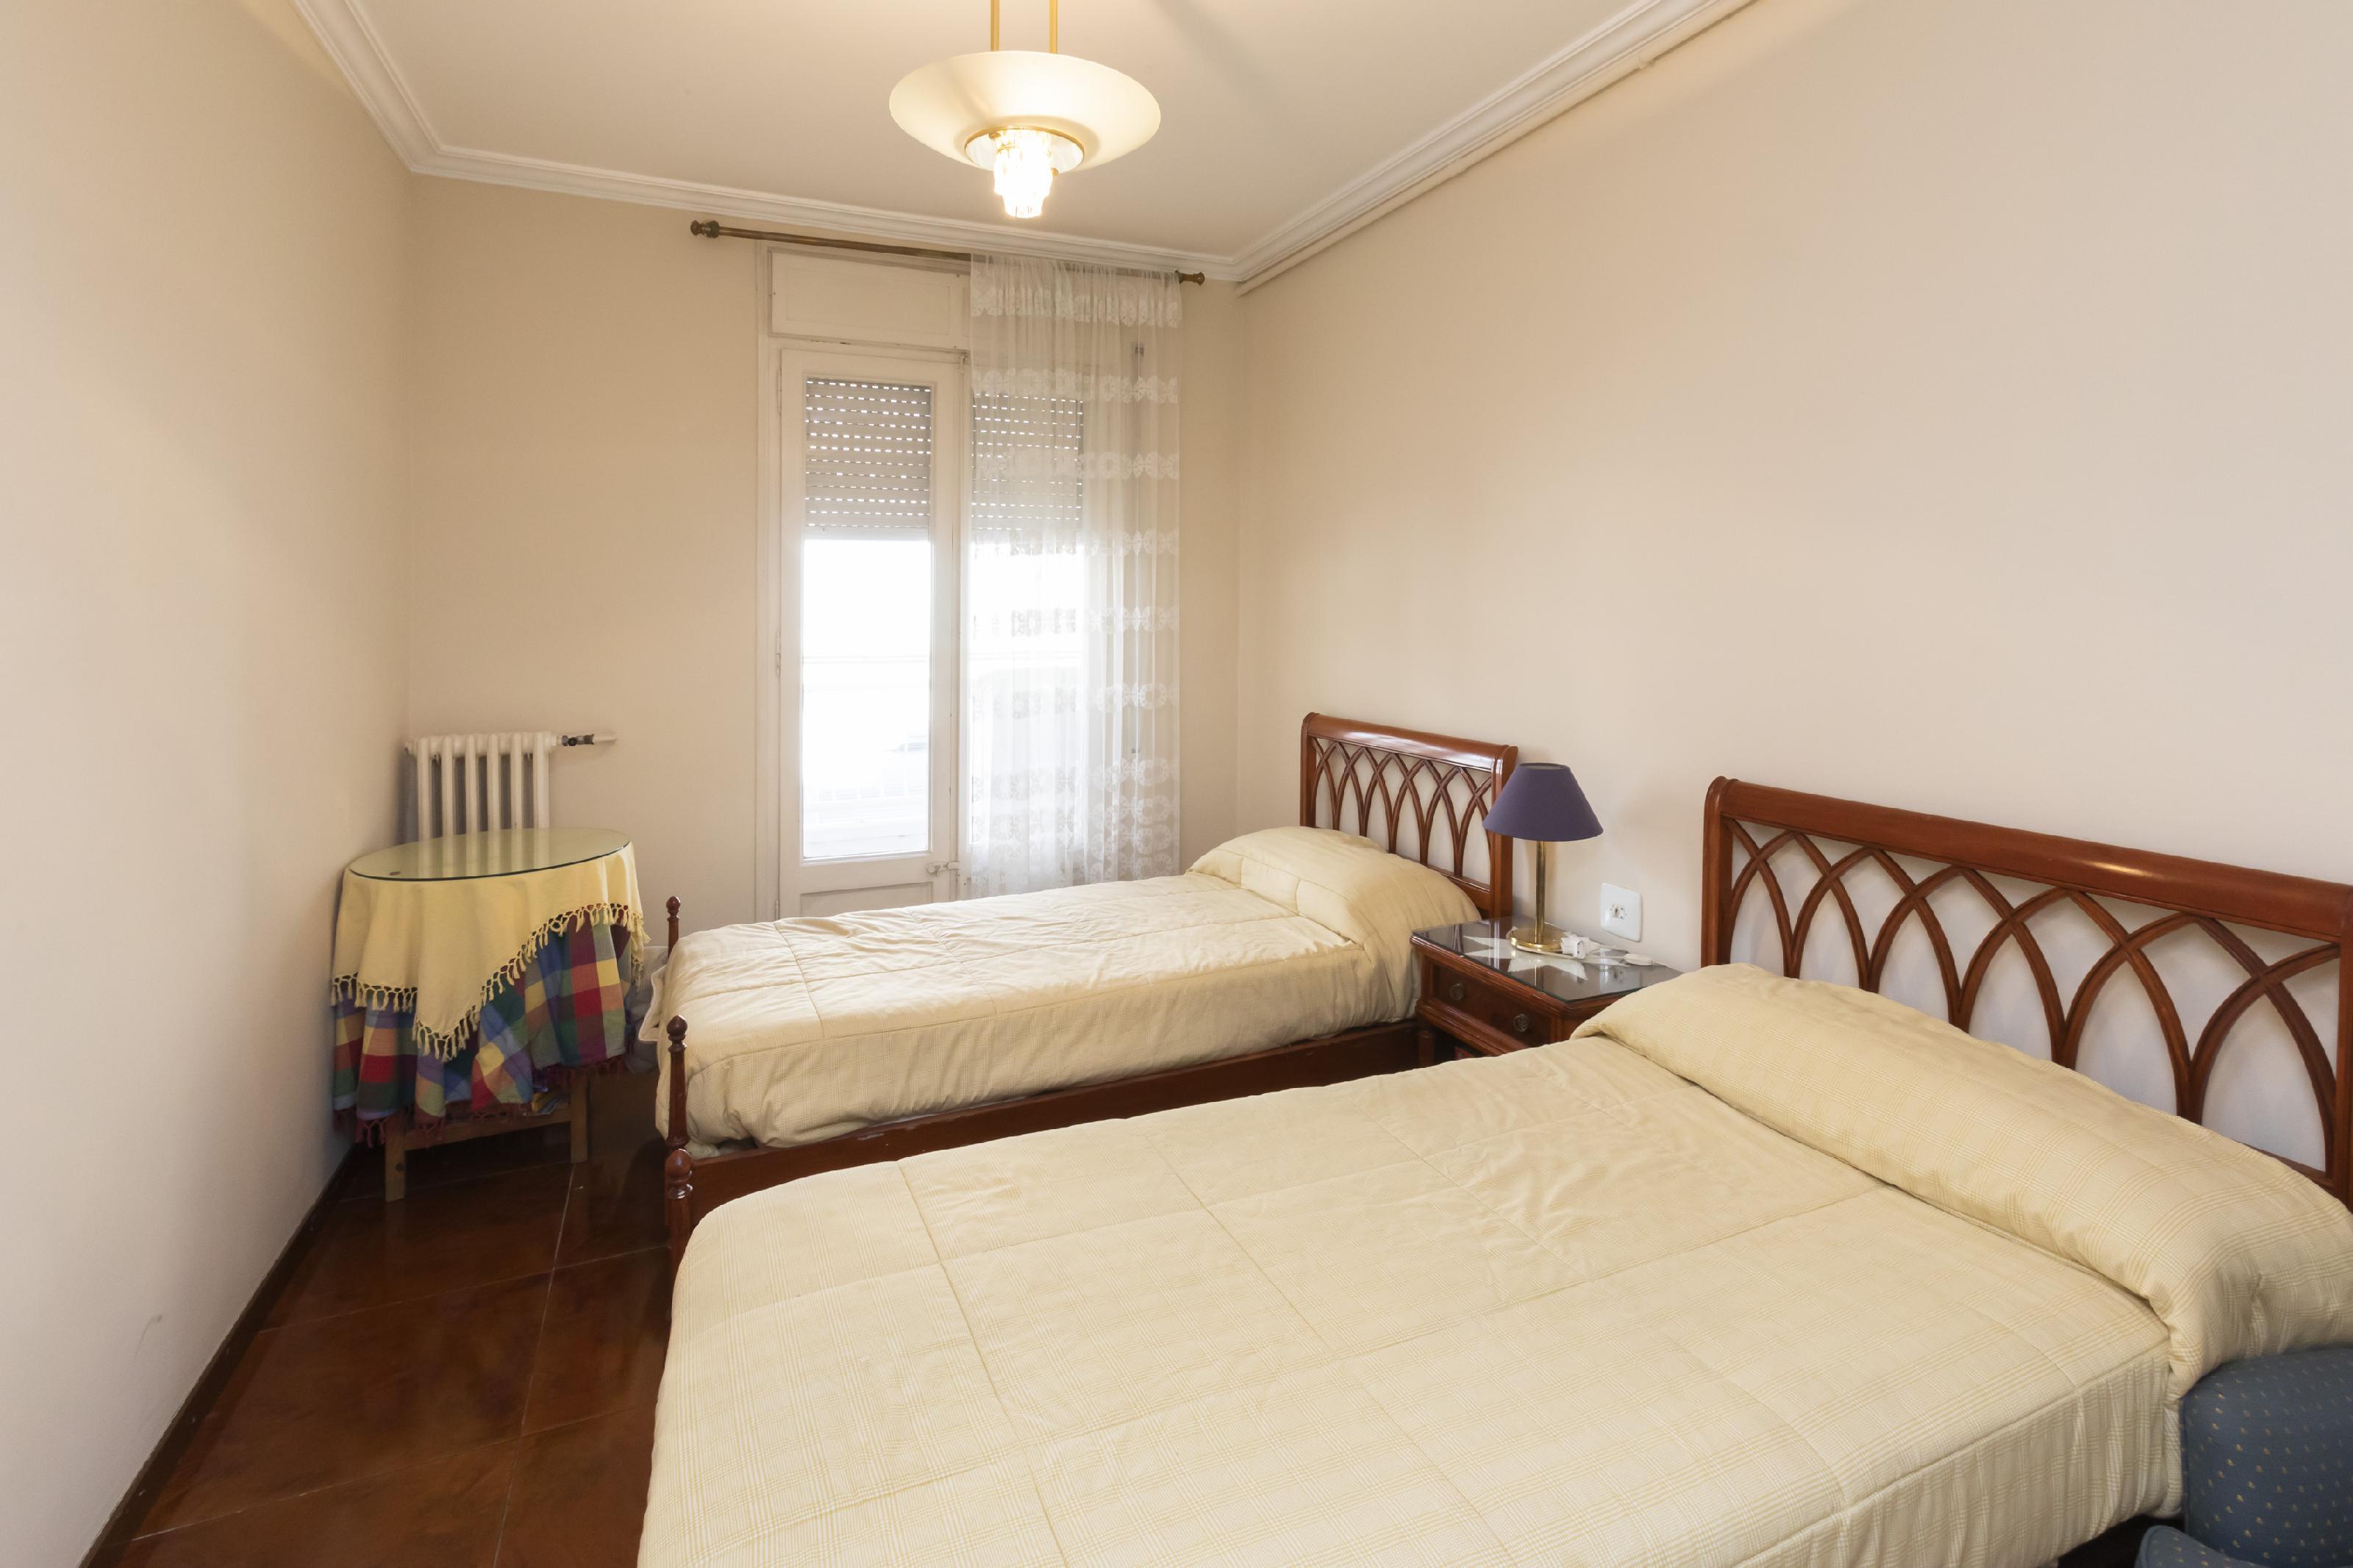 247097 Flat for sale in Sarrià-Sant Gervasi, Sant Gervasi-Galvany 17